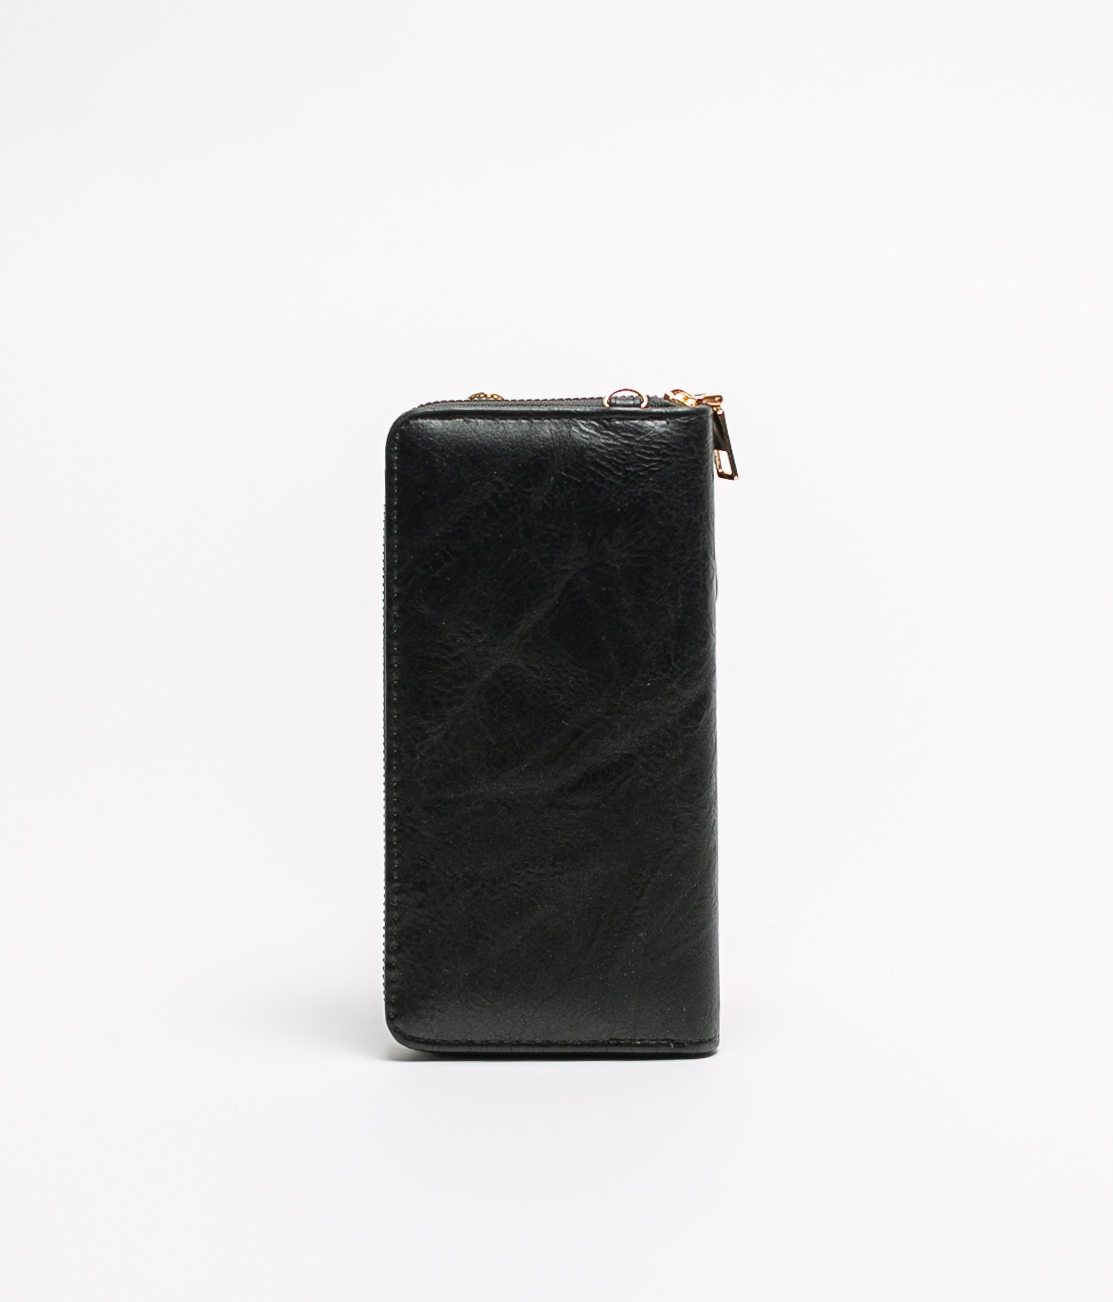 CORANE MOBILE HOLDER - BLACK